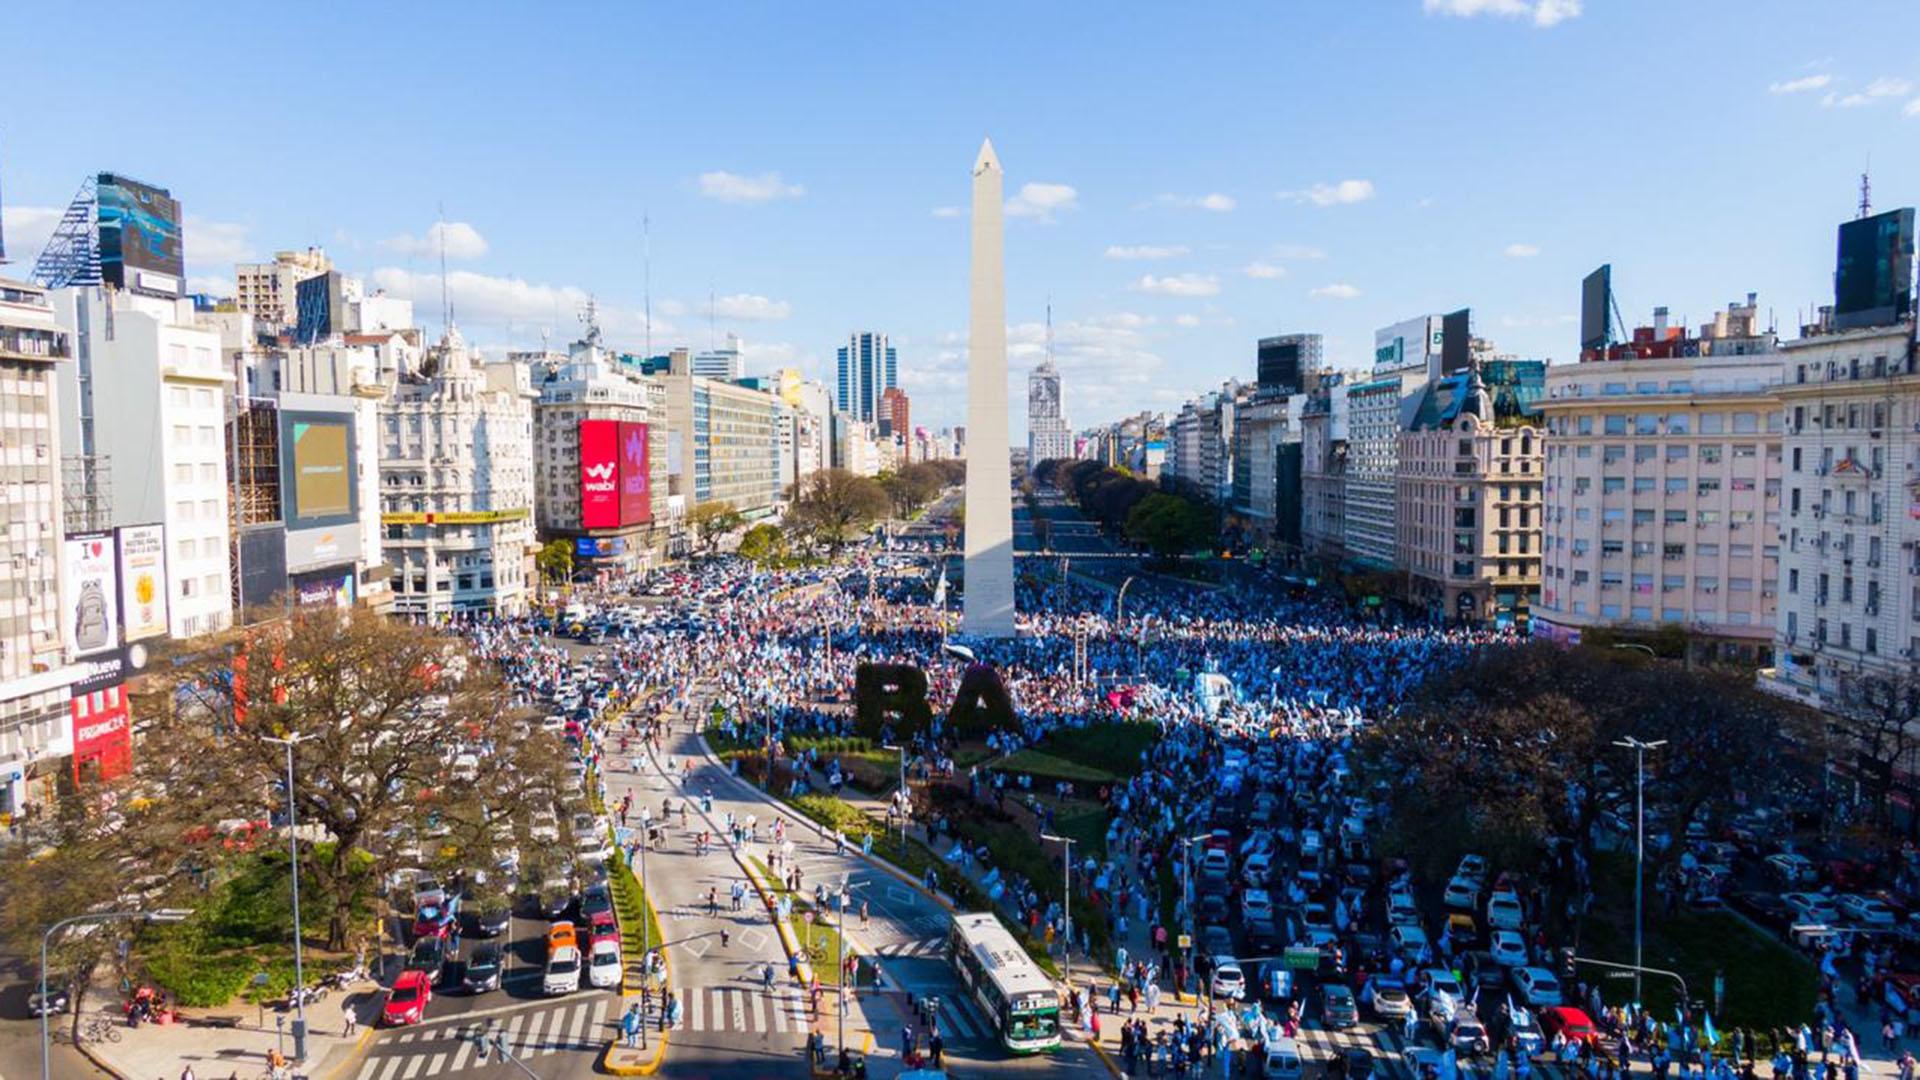 El centro porteño estuvo colmado de autos con manifestantes (Thomas Khazki)